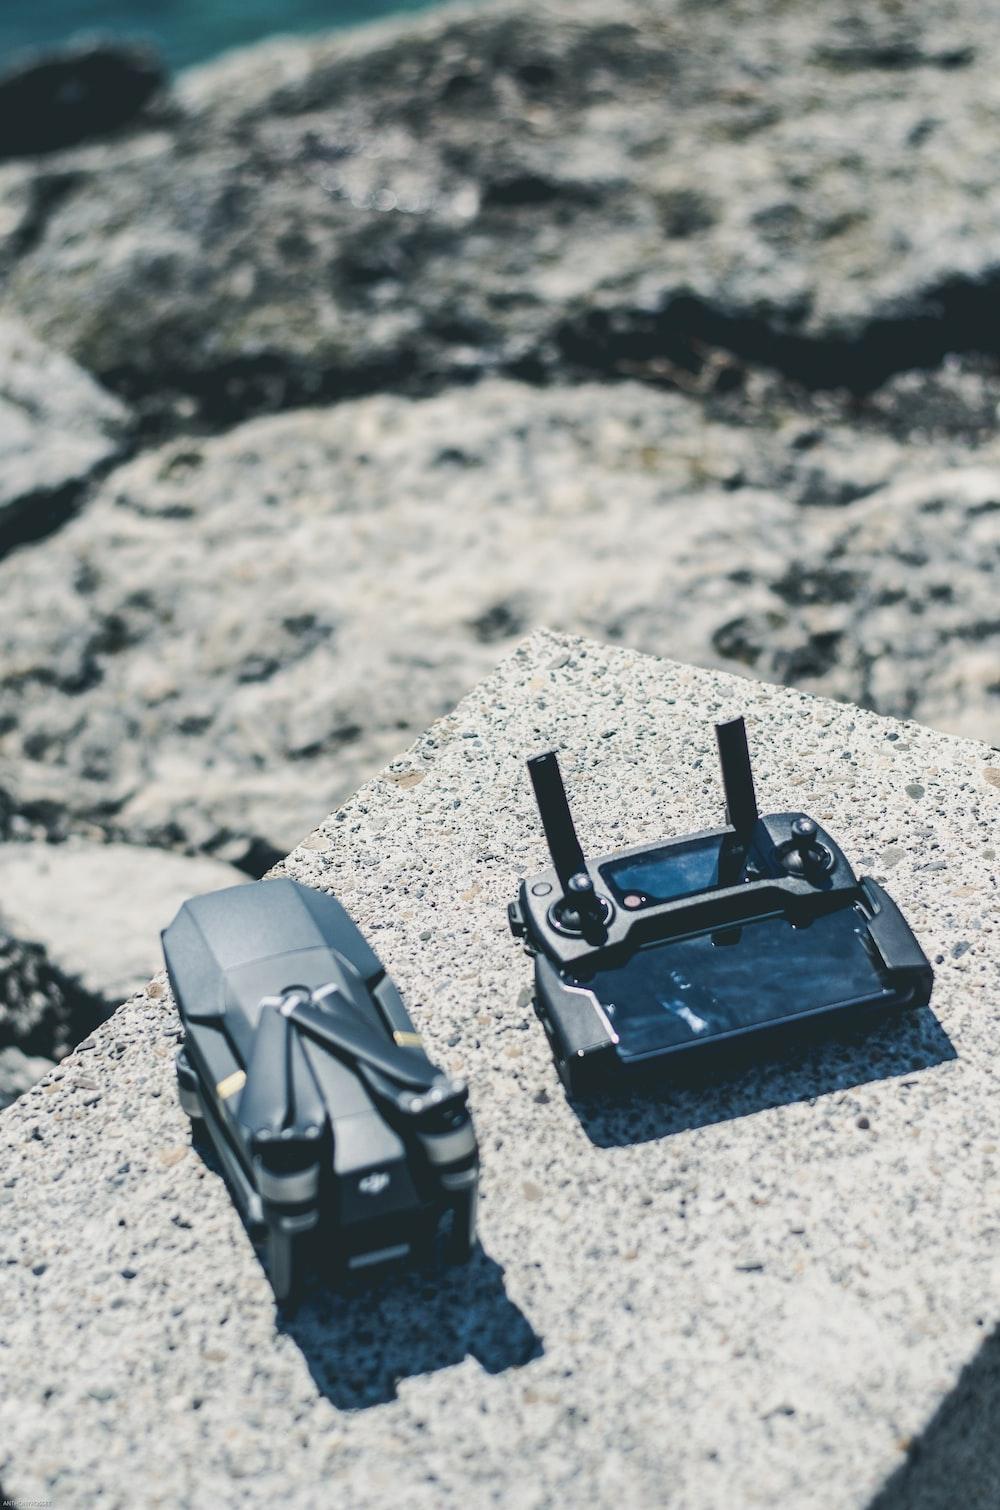 black DJI Mavic drone and controller on platform concrete